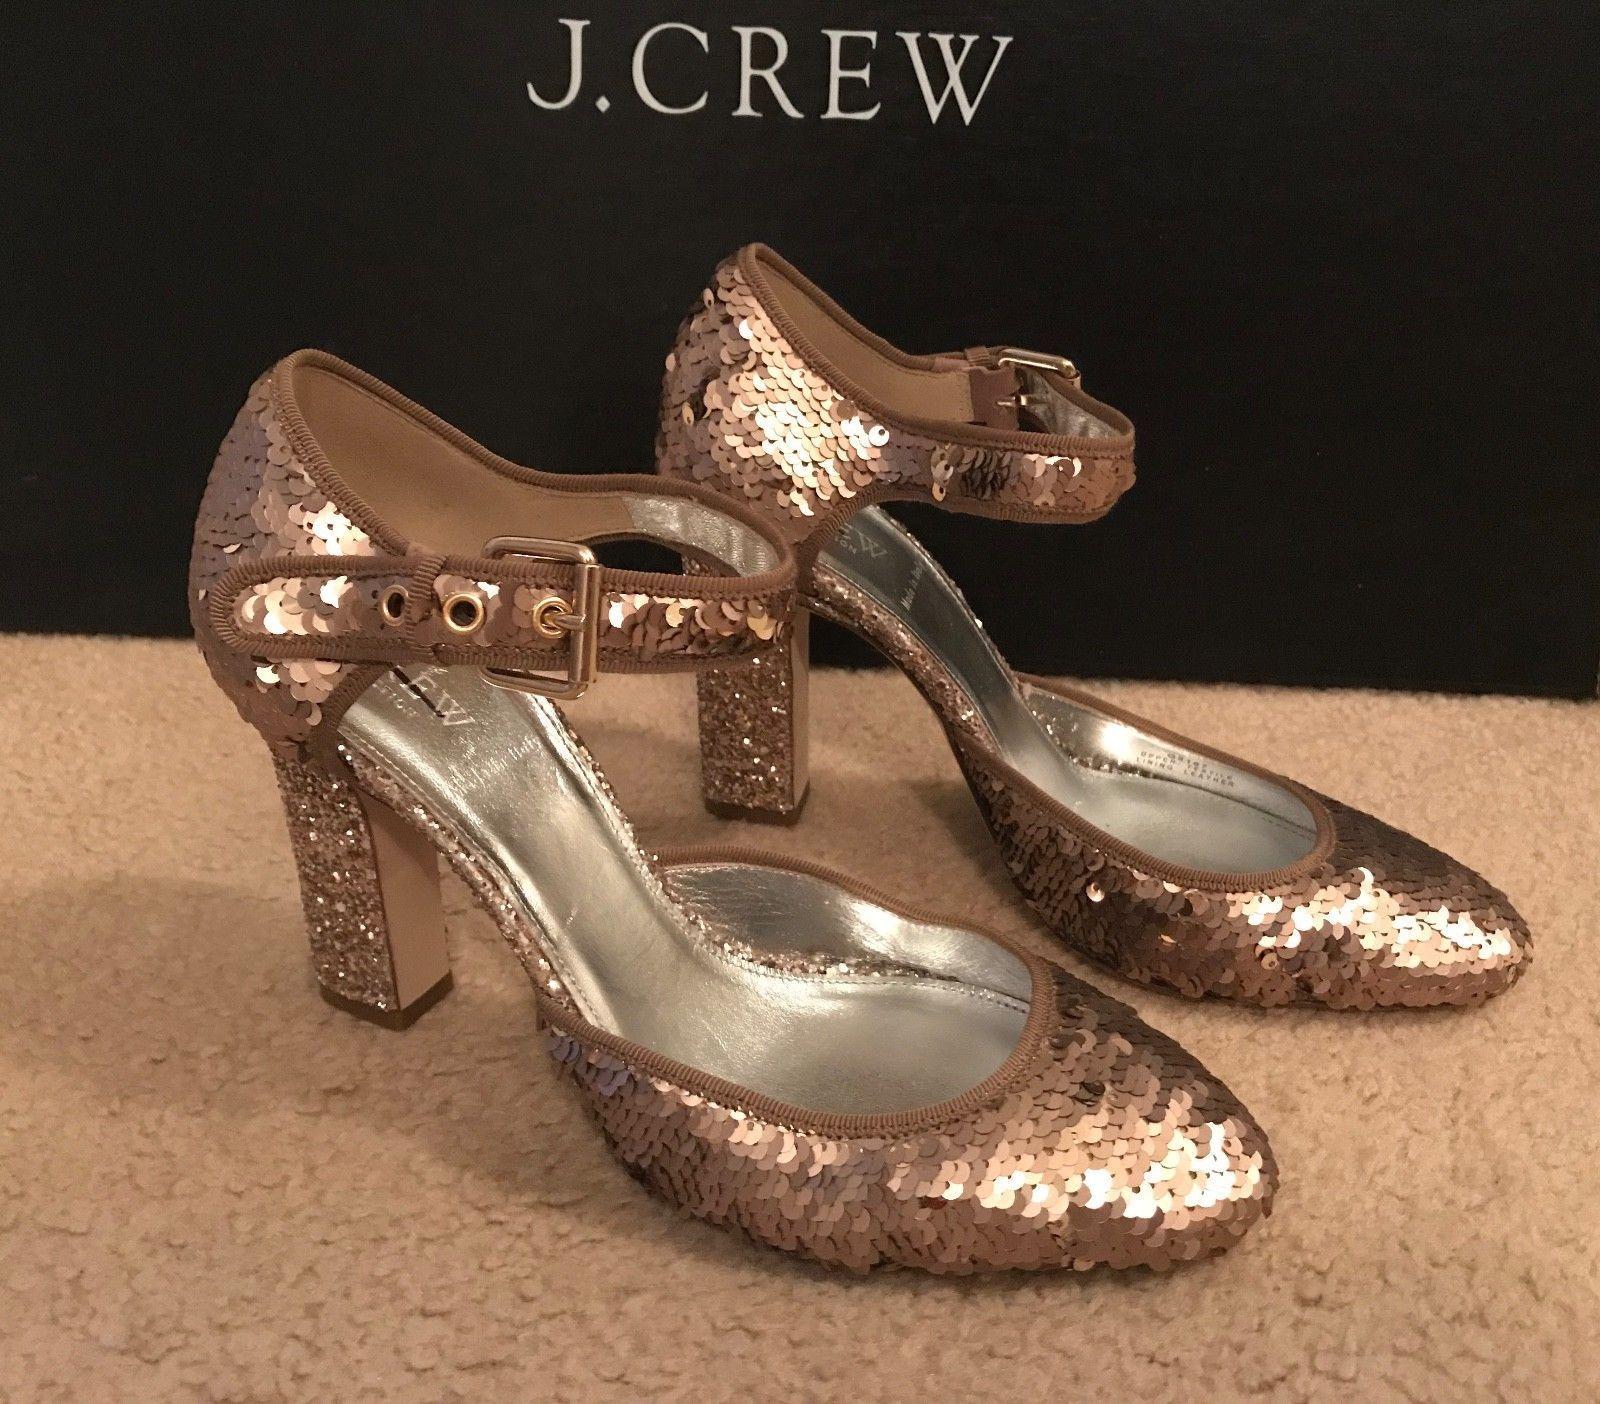 J.CREW MARY JANE SEQUIN PUMPS SIZE 8.5M BRONZE PINK G8167